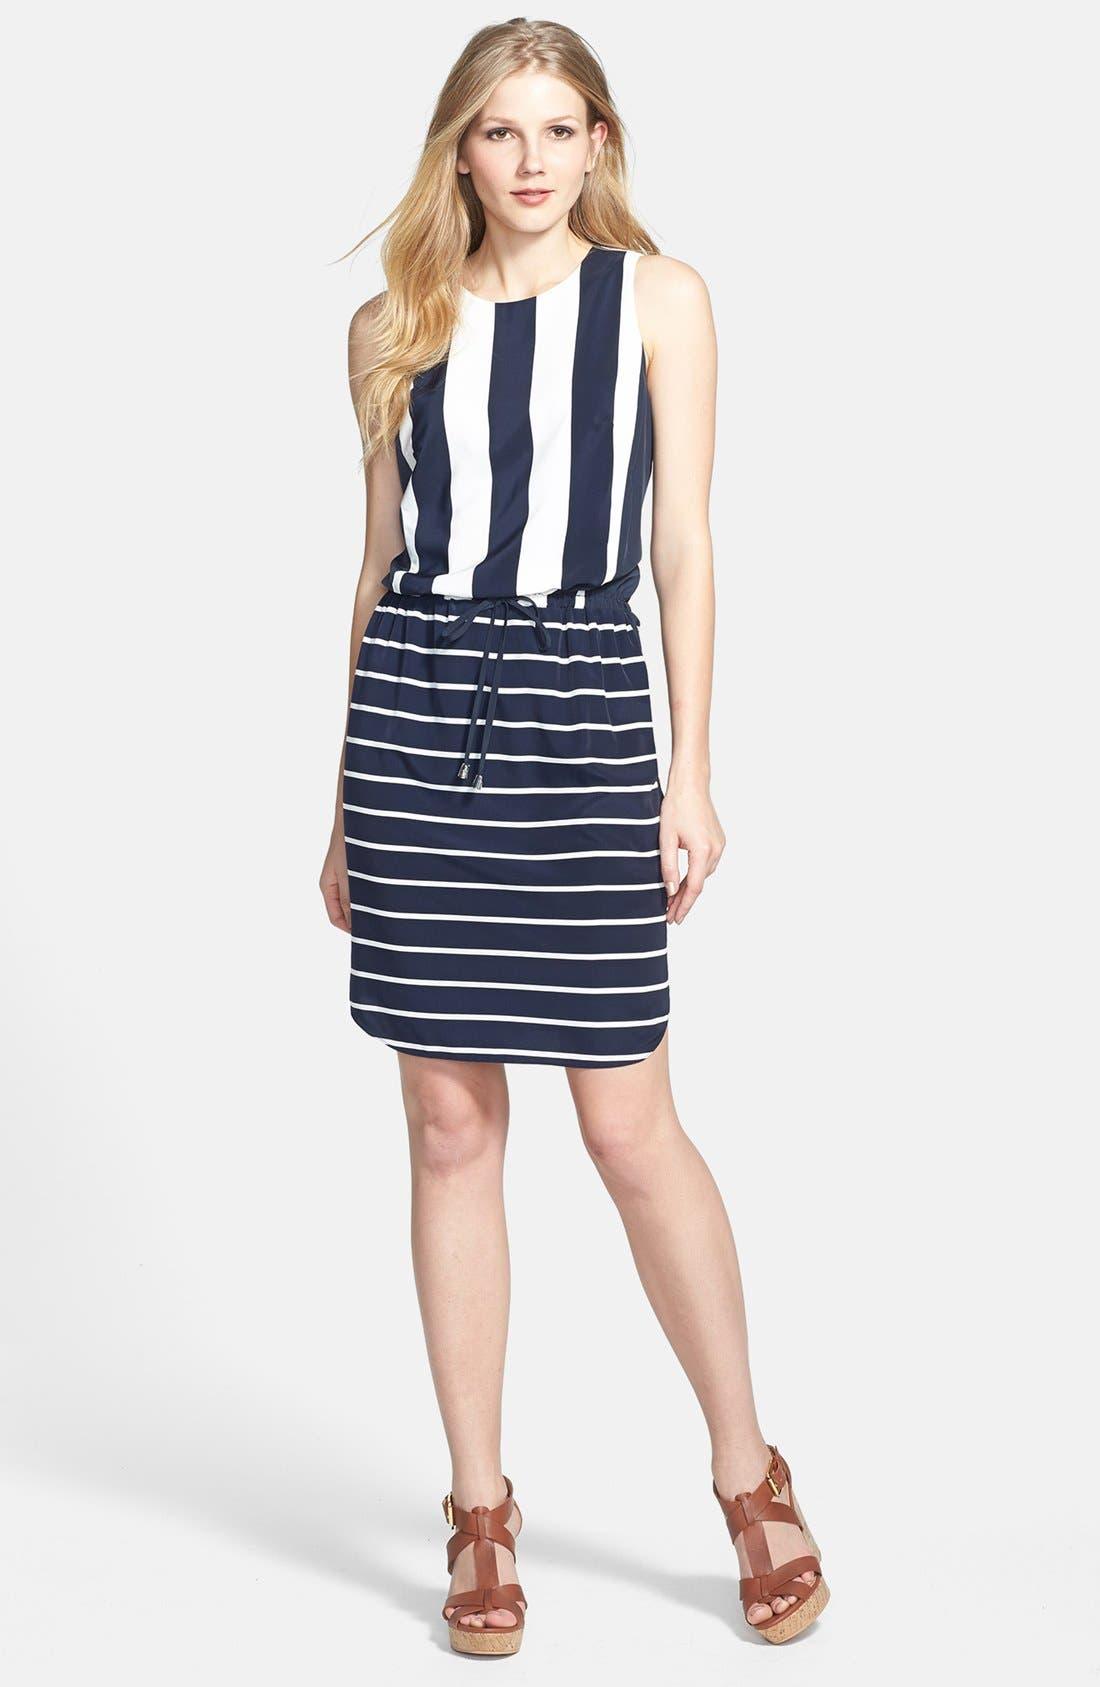 Main Image - Vince Camuto 'Yacht Stripe' Mixed Print Dress (Regular & Petite)